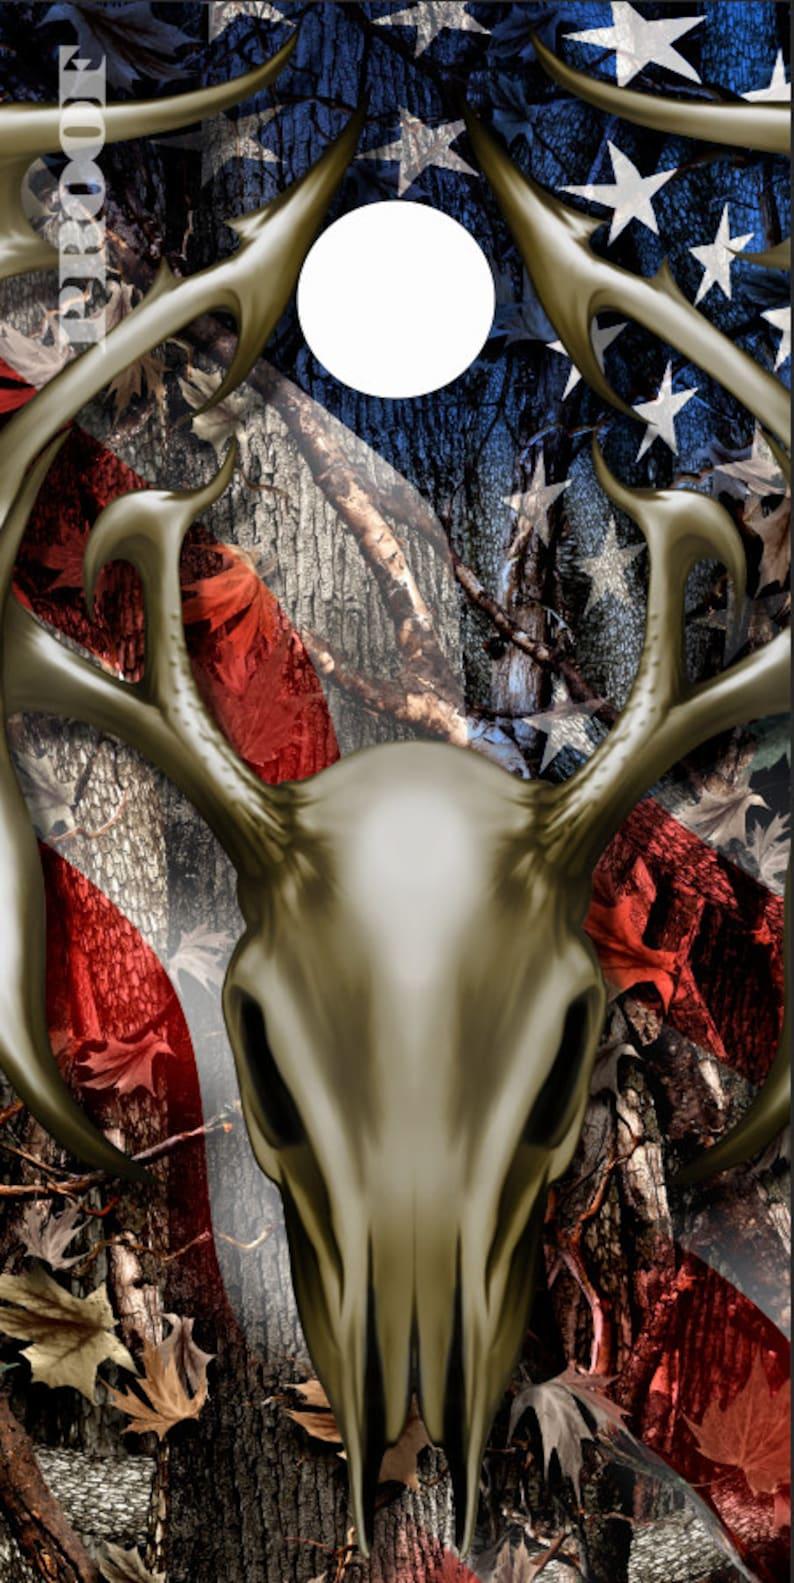 Tribal Buck Skull Flag Camo LAMINATED Cornhole Wrap Bag Toss Decal Baggo Skin Sticker Wraps